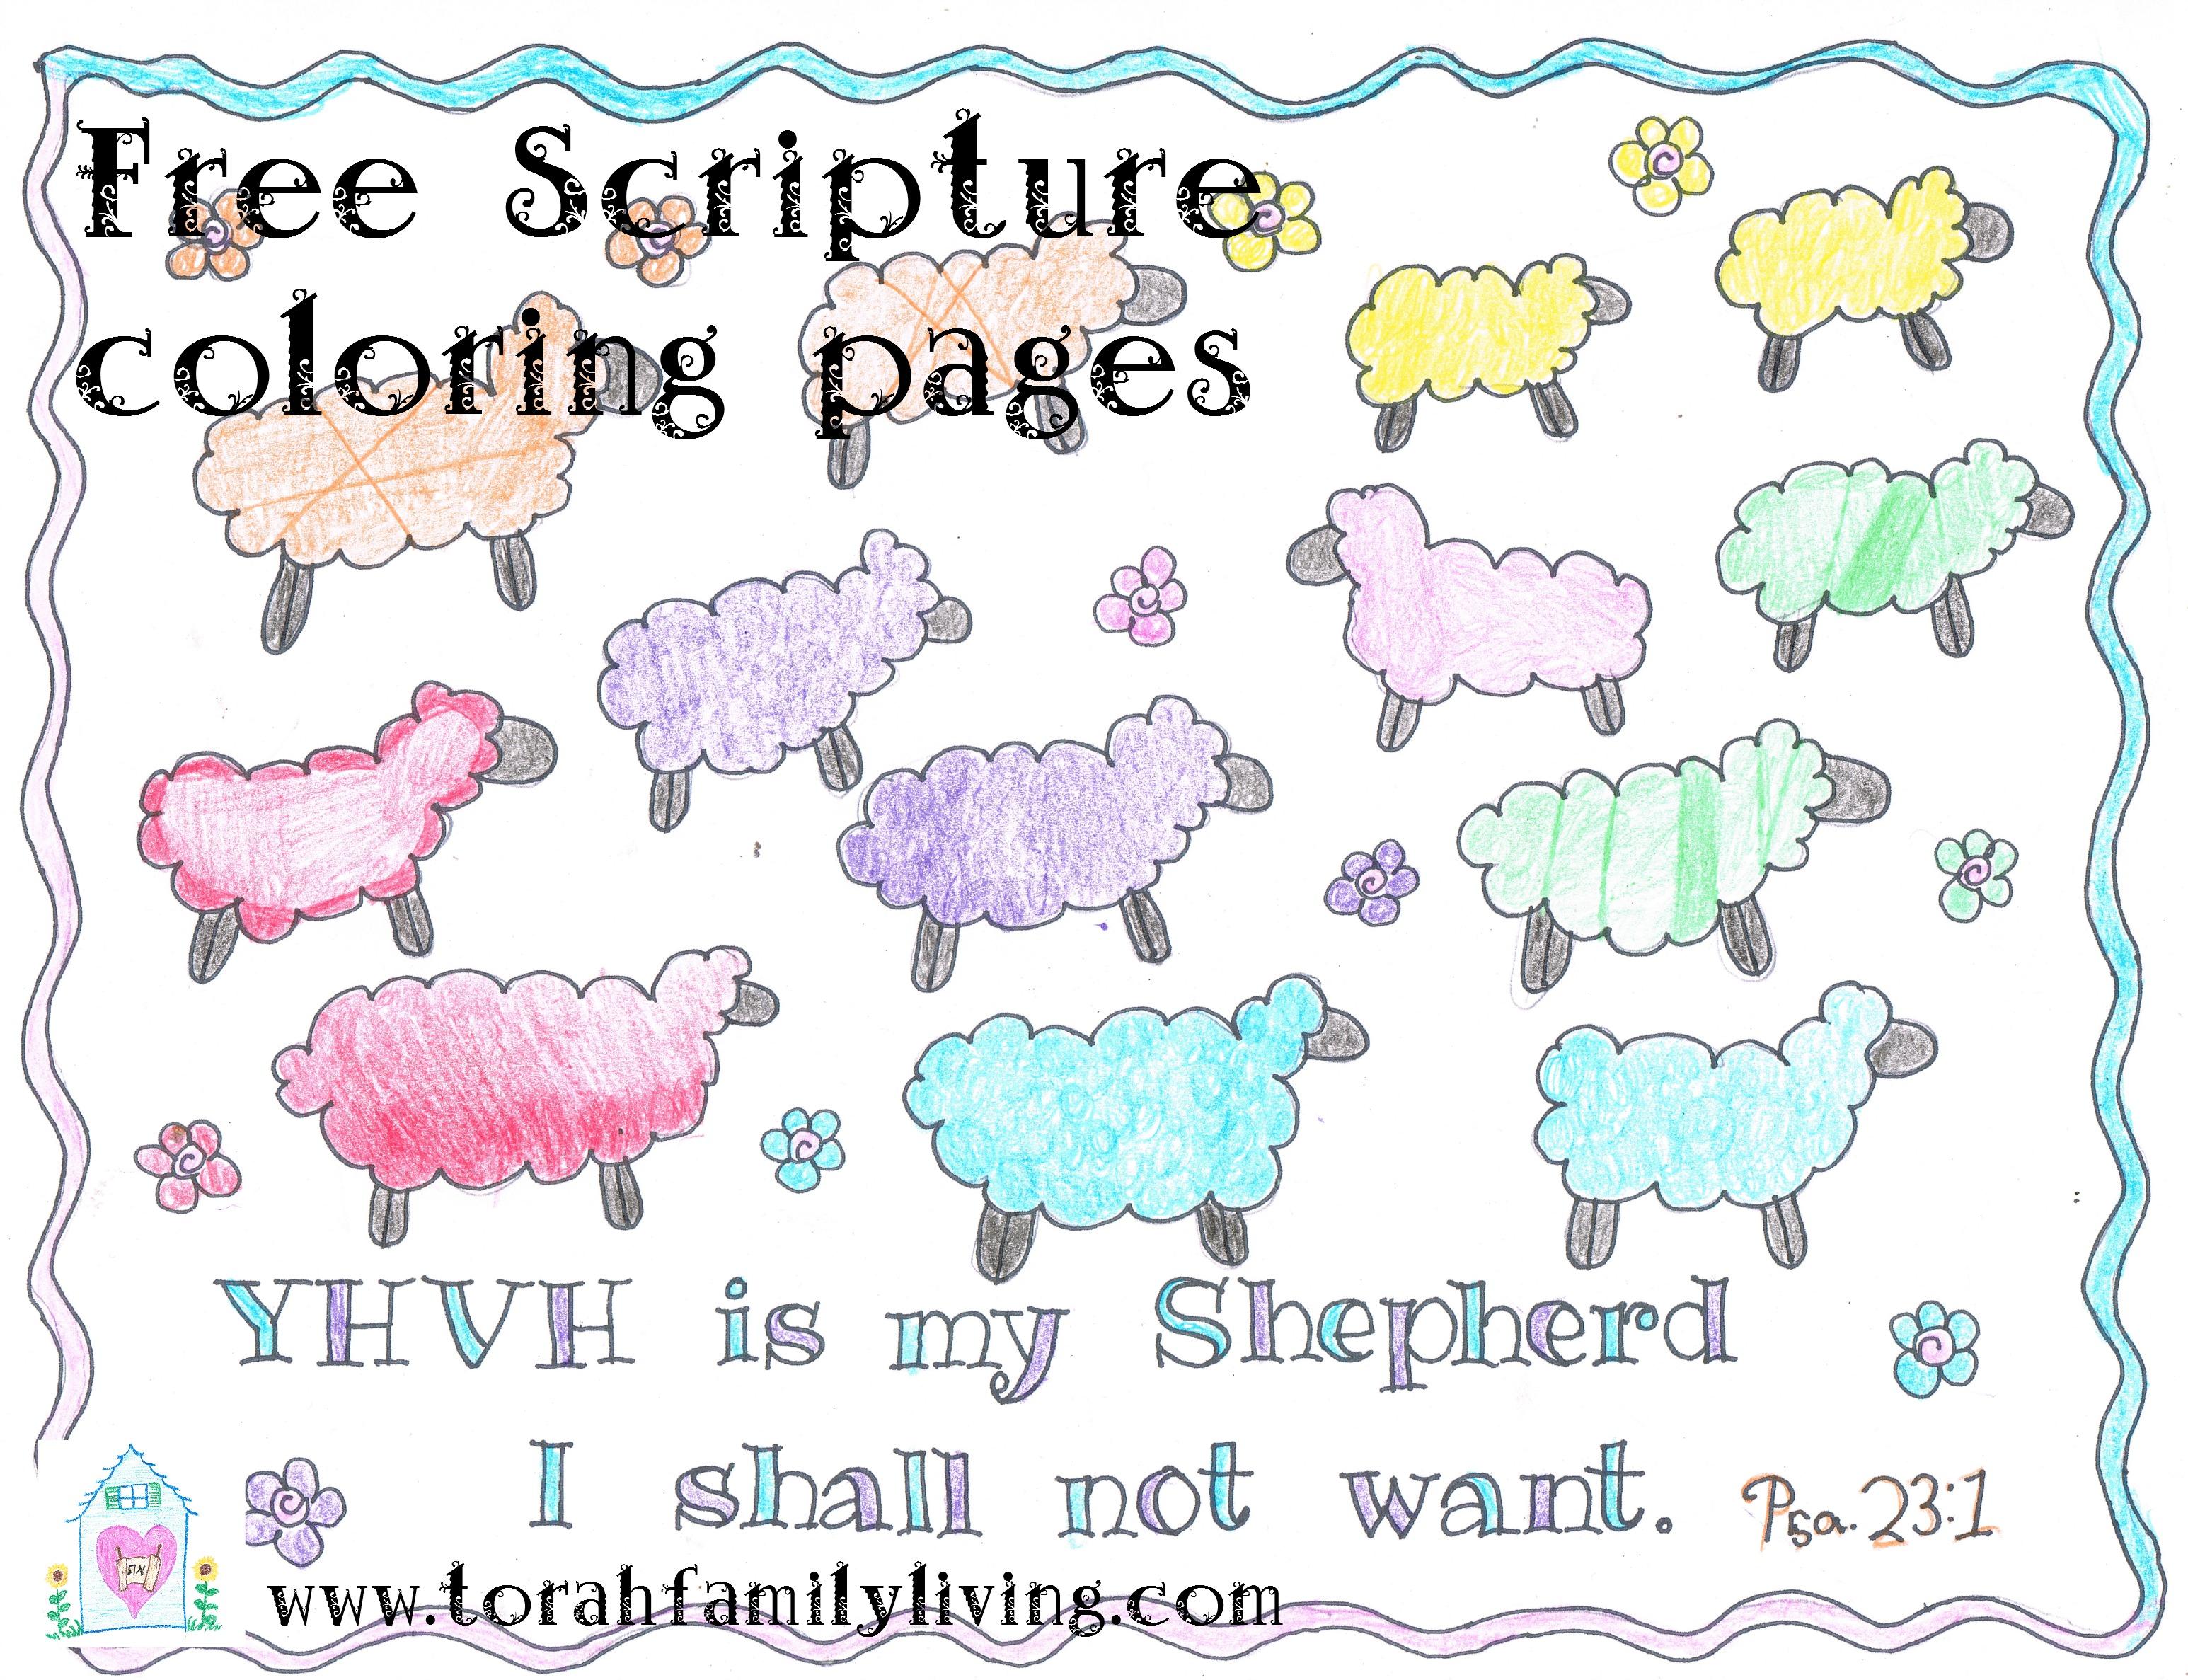 Torah tots coloring pages shabbat - Scripture Coloring Pages Torah Family Living